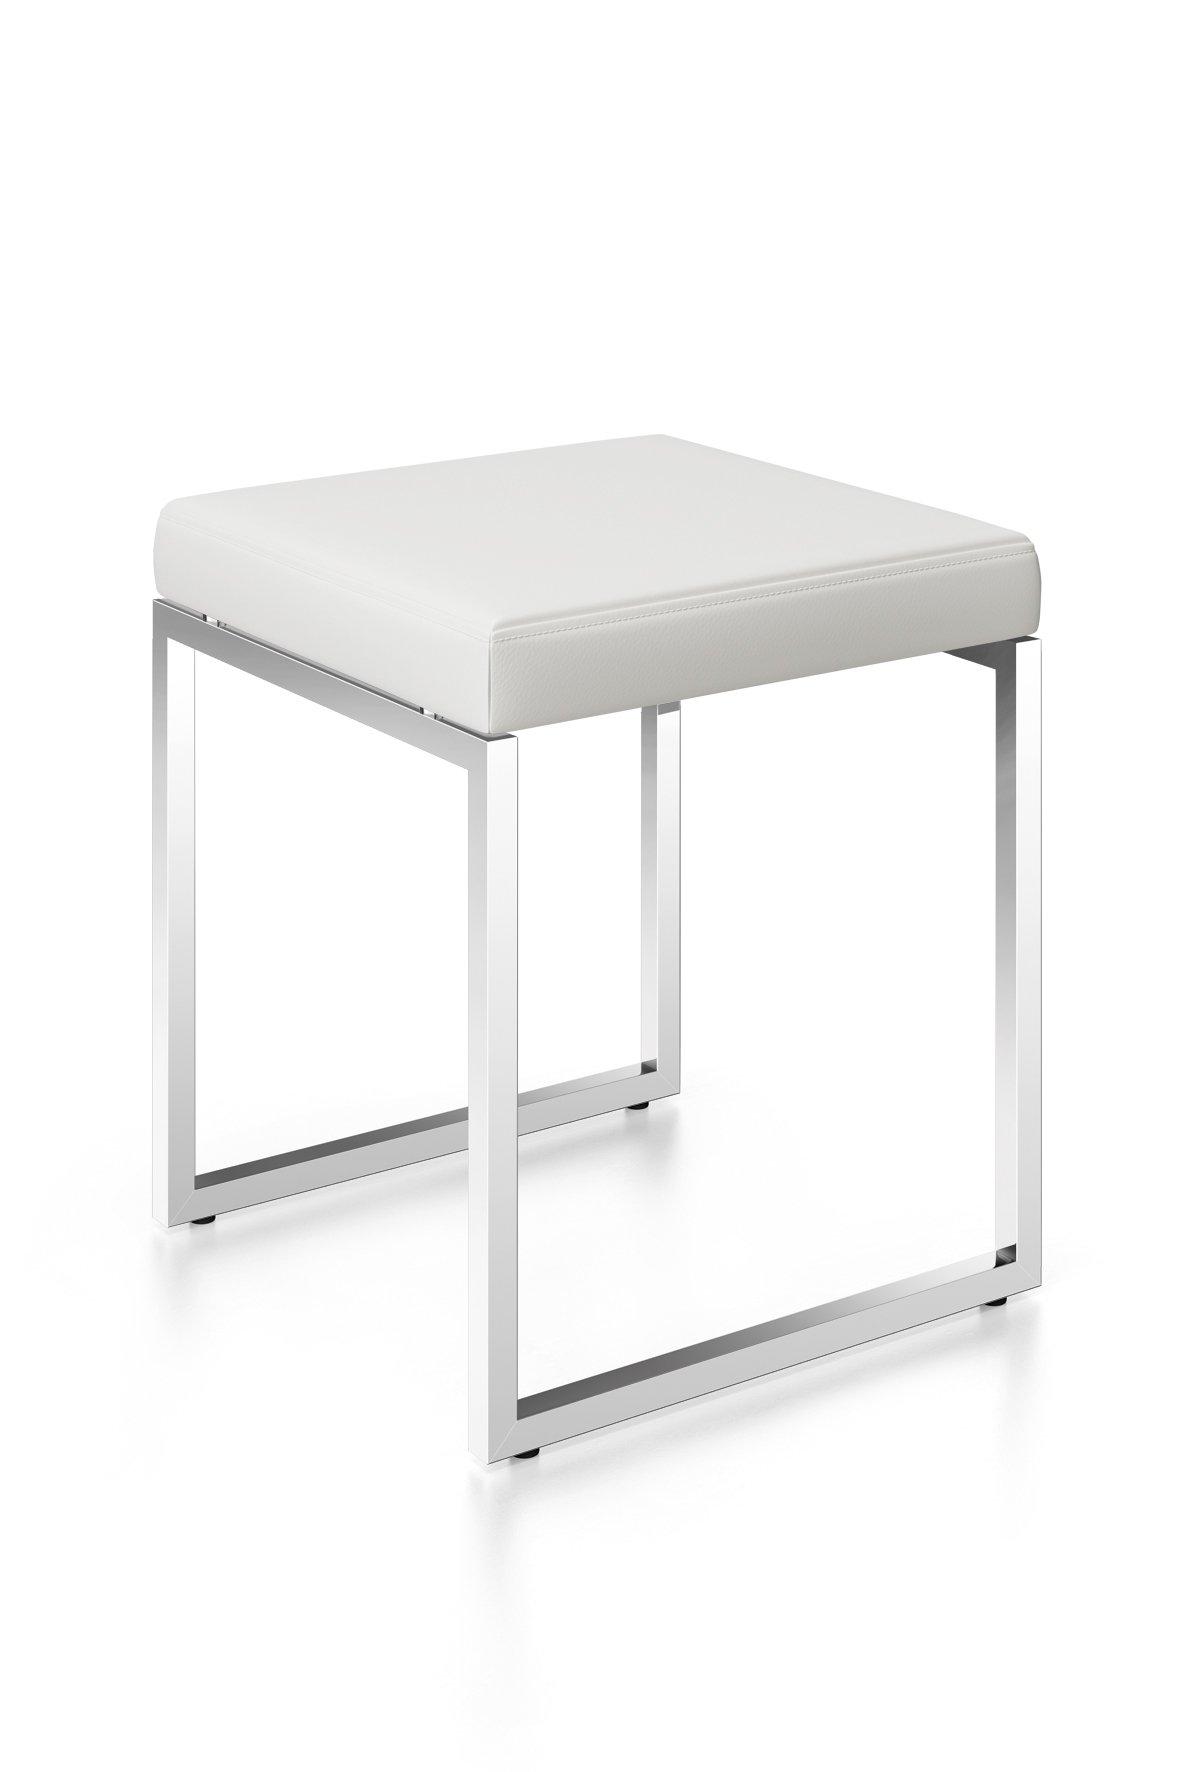 ZACK 40334 Original ''Cenius'' Stool White High Gloss Leather Seat, 17.9'' x 15.7''